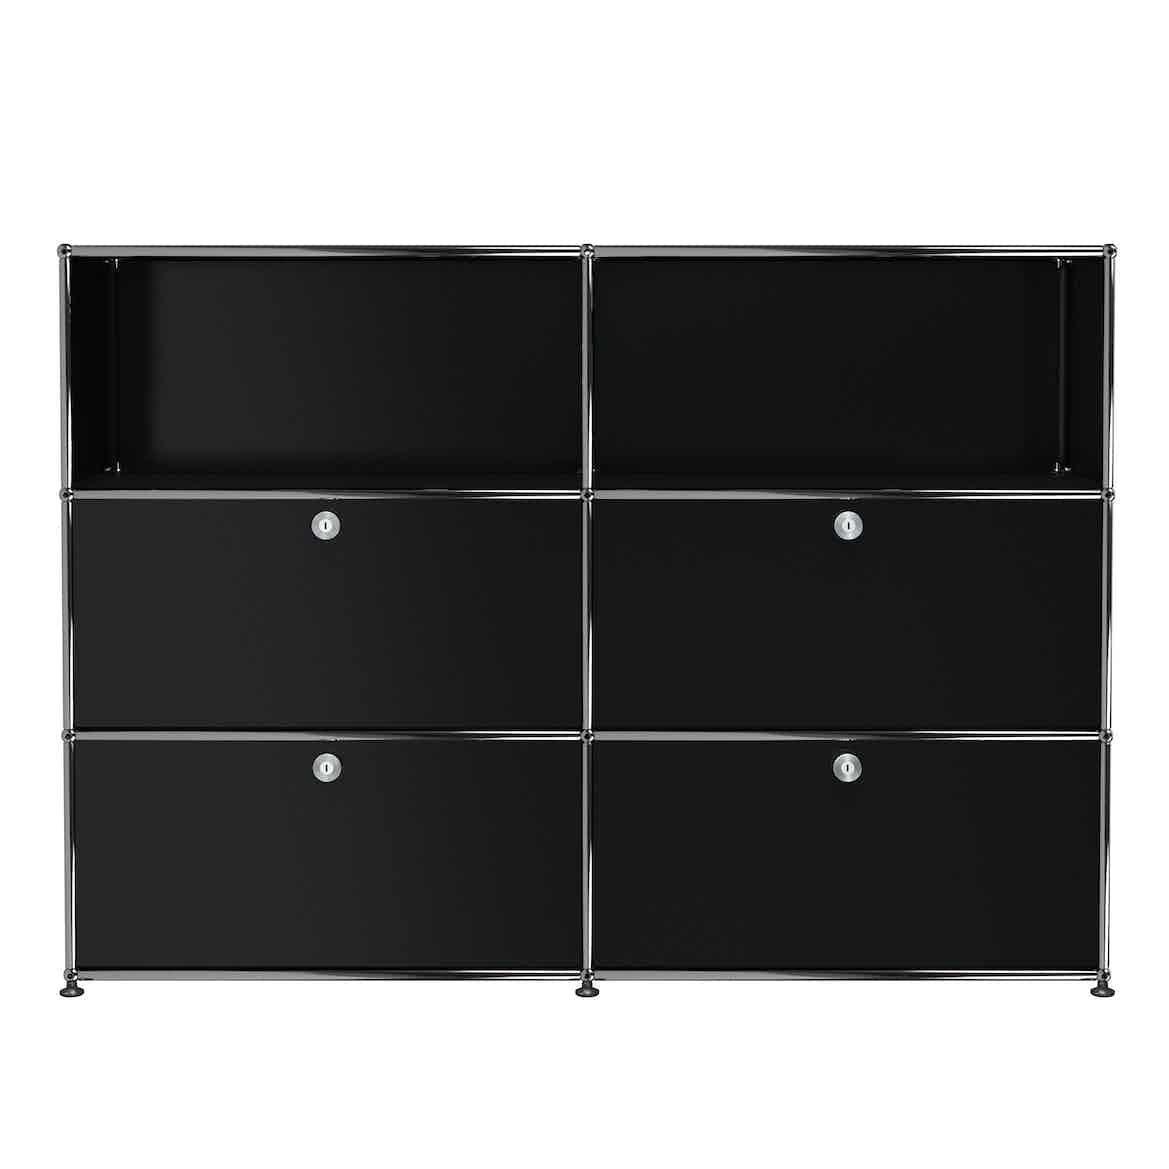 Usm-quick-shop-Haller-Storage-G2A-black-haute-living